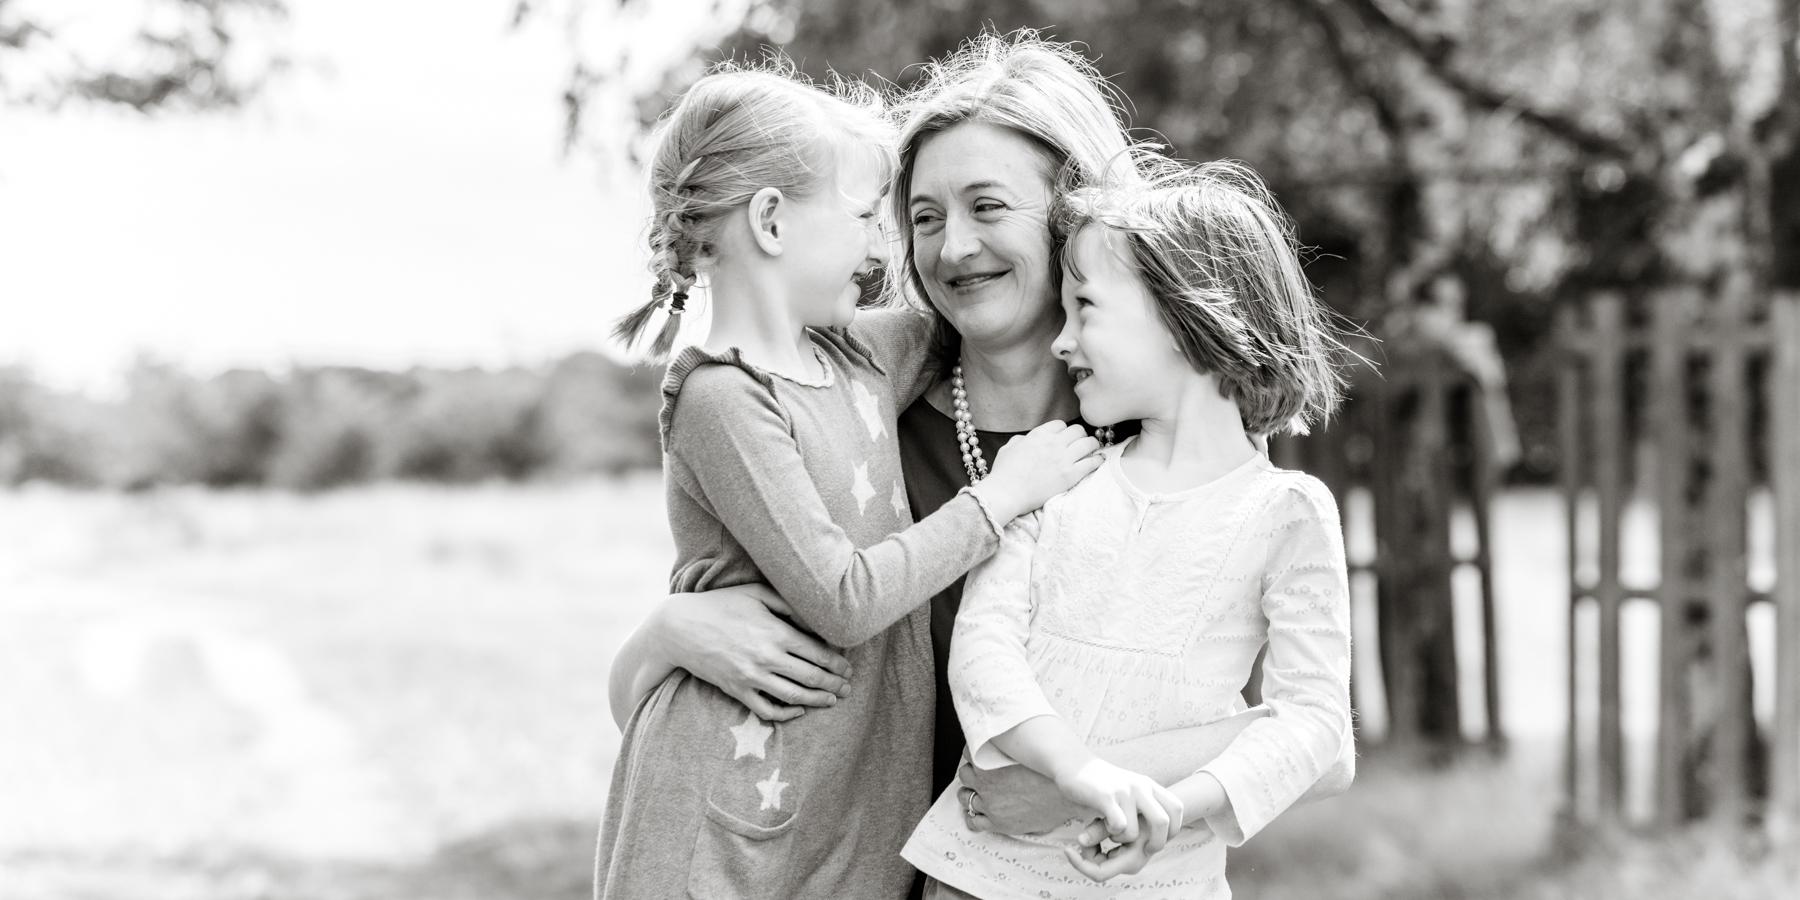 Birchall Family 2020 - Golrizphotography82